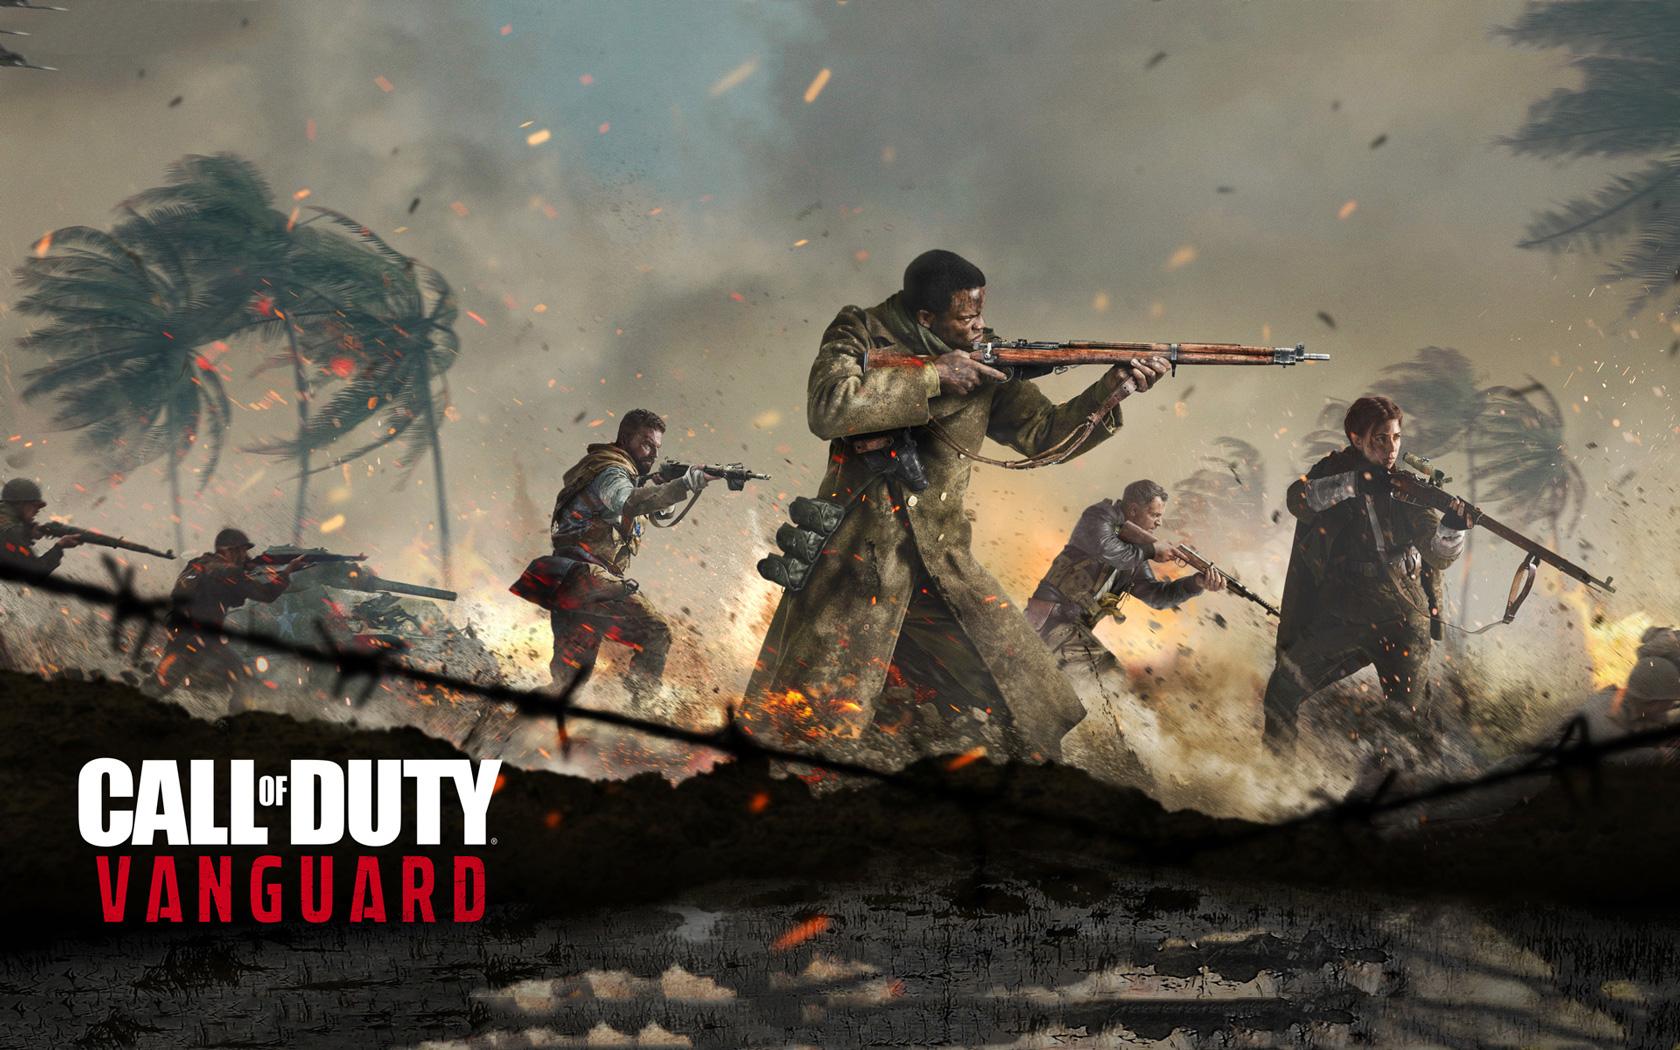 Free Call of Duty: Vanguard Wallpaper in 1680x1050